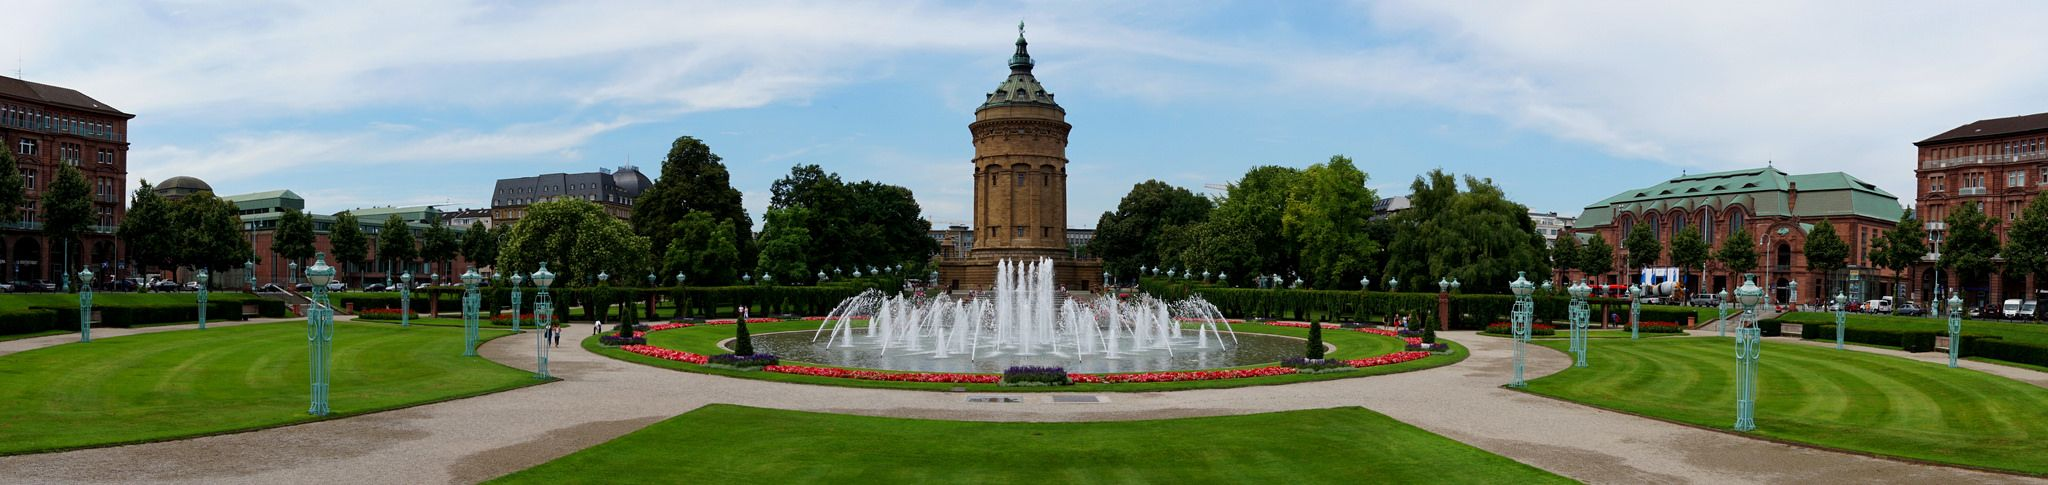 https://flic.kr/p/pYPm8B | Mannheim panorama | Mannheim architecture panorama, fountains surrounding the Wasserturm (water tower) in the center of Mannheim